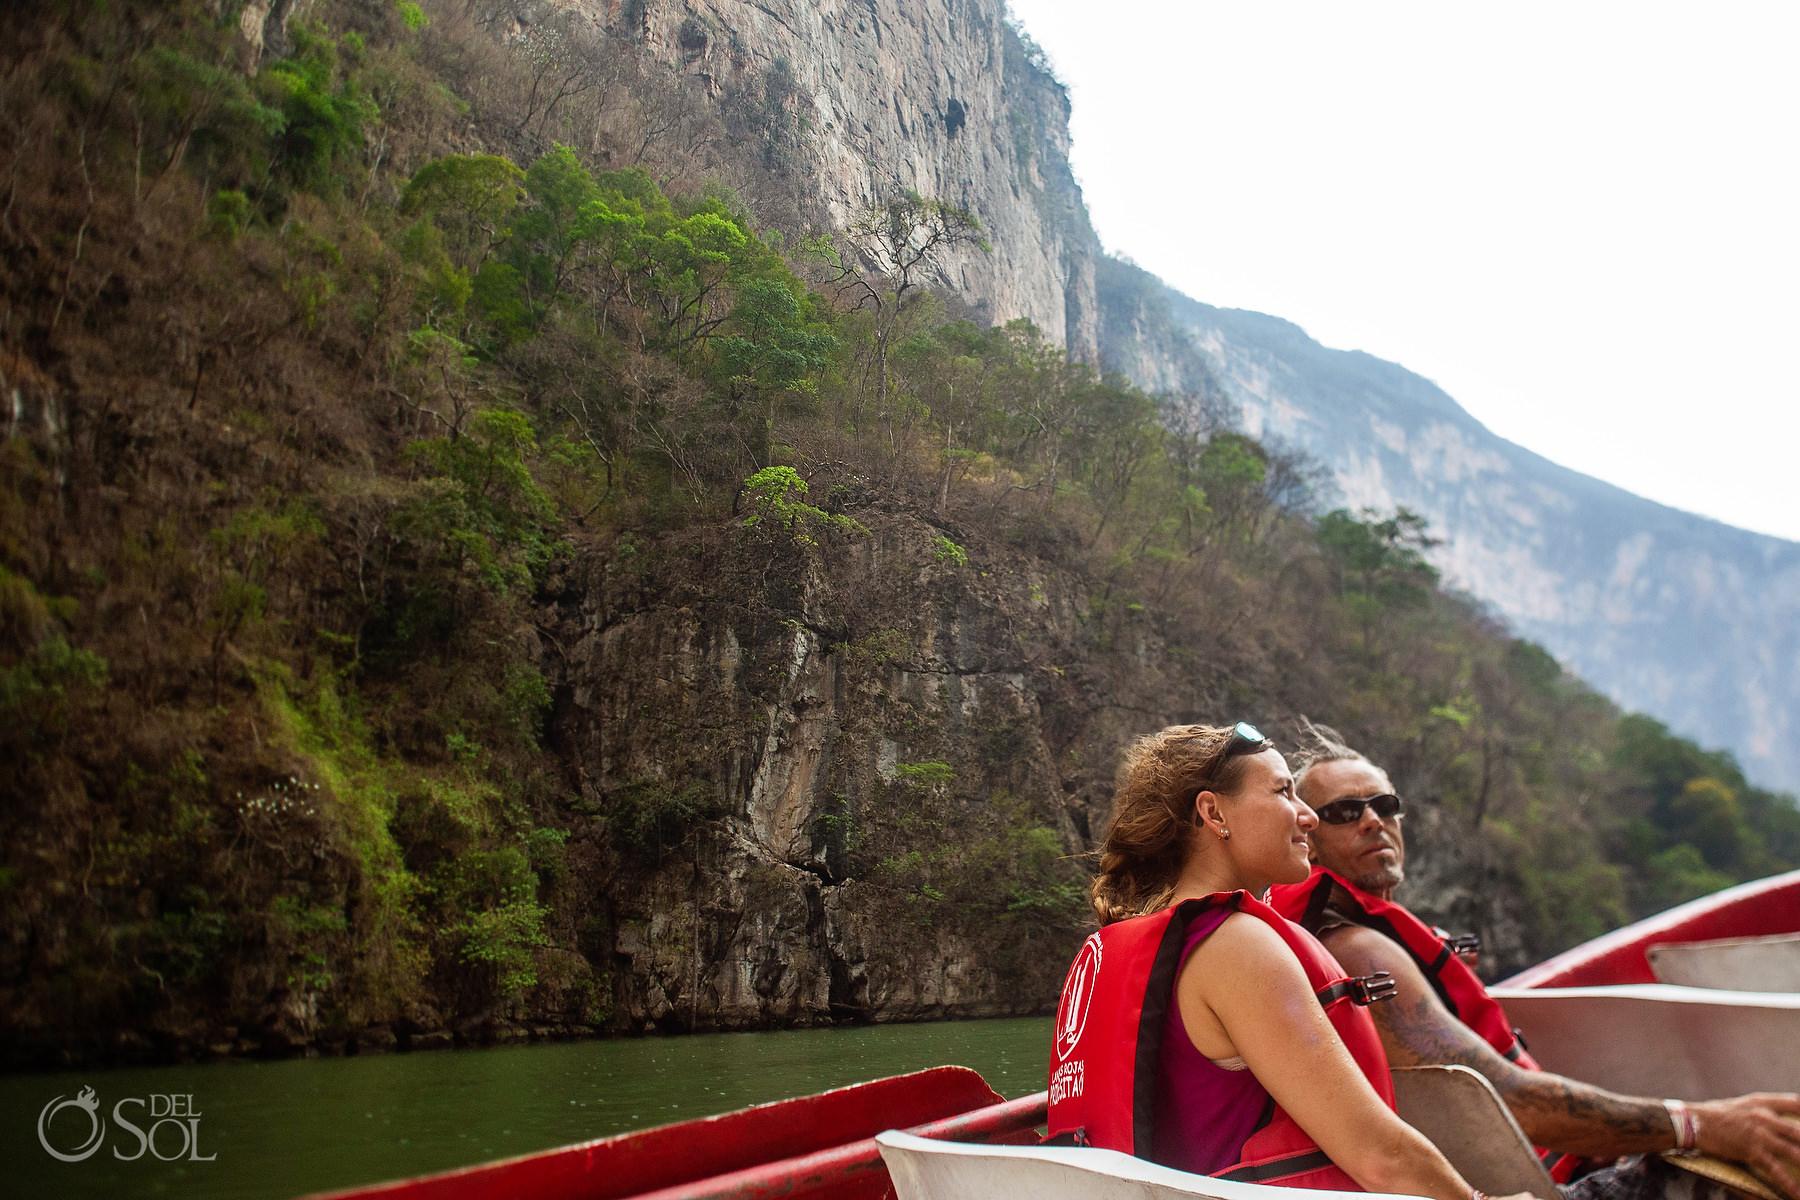 canyon de sumidero chiapas mexico vow renewal experience